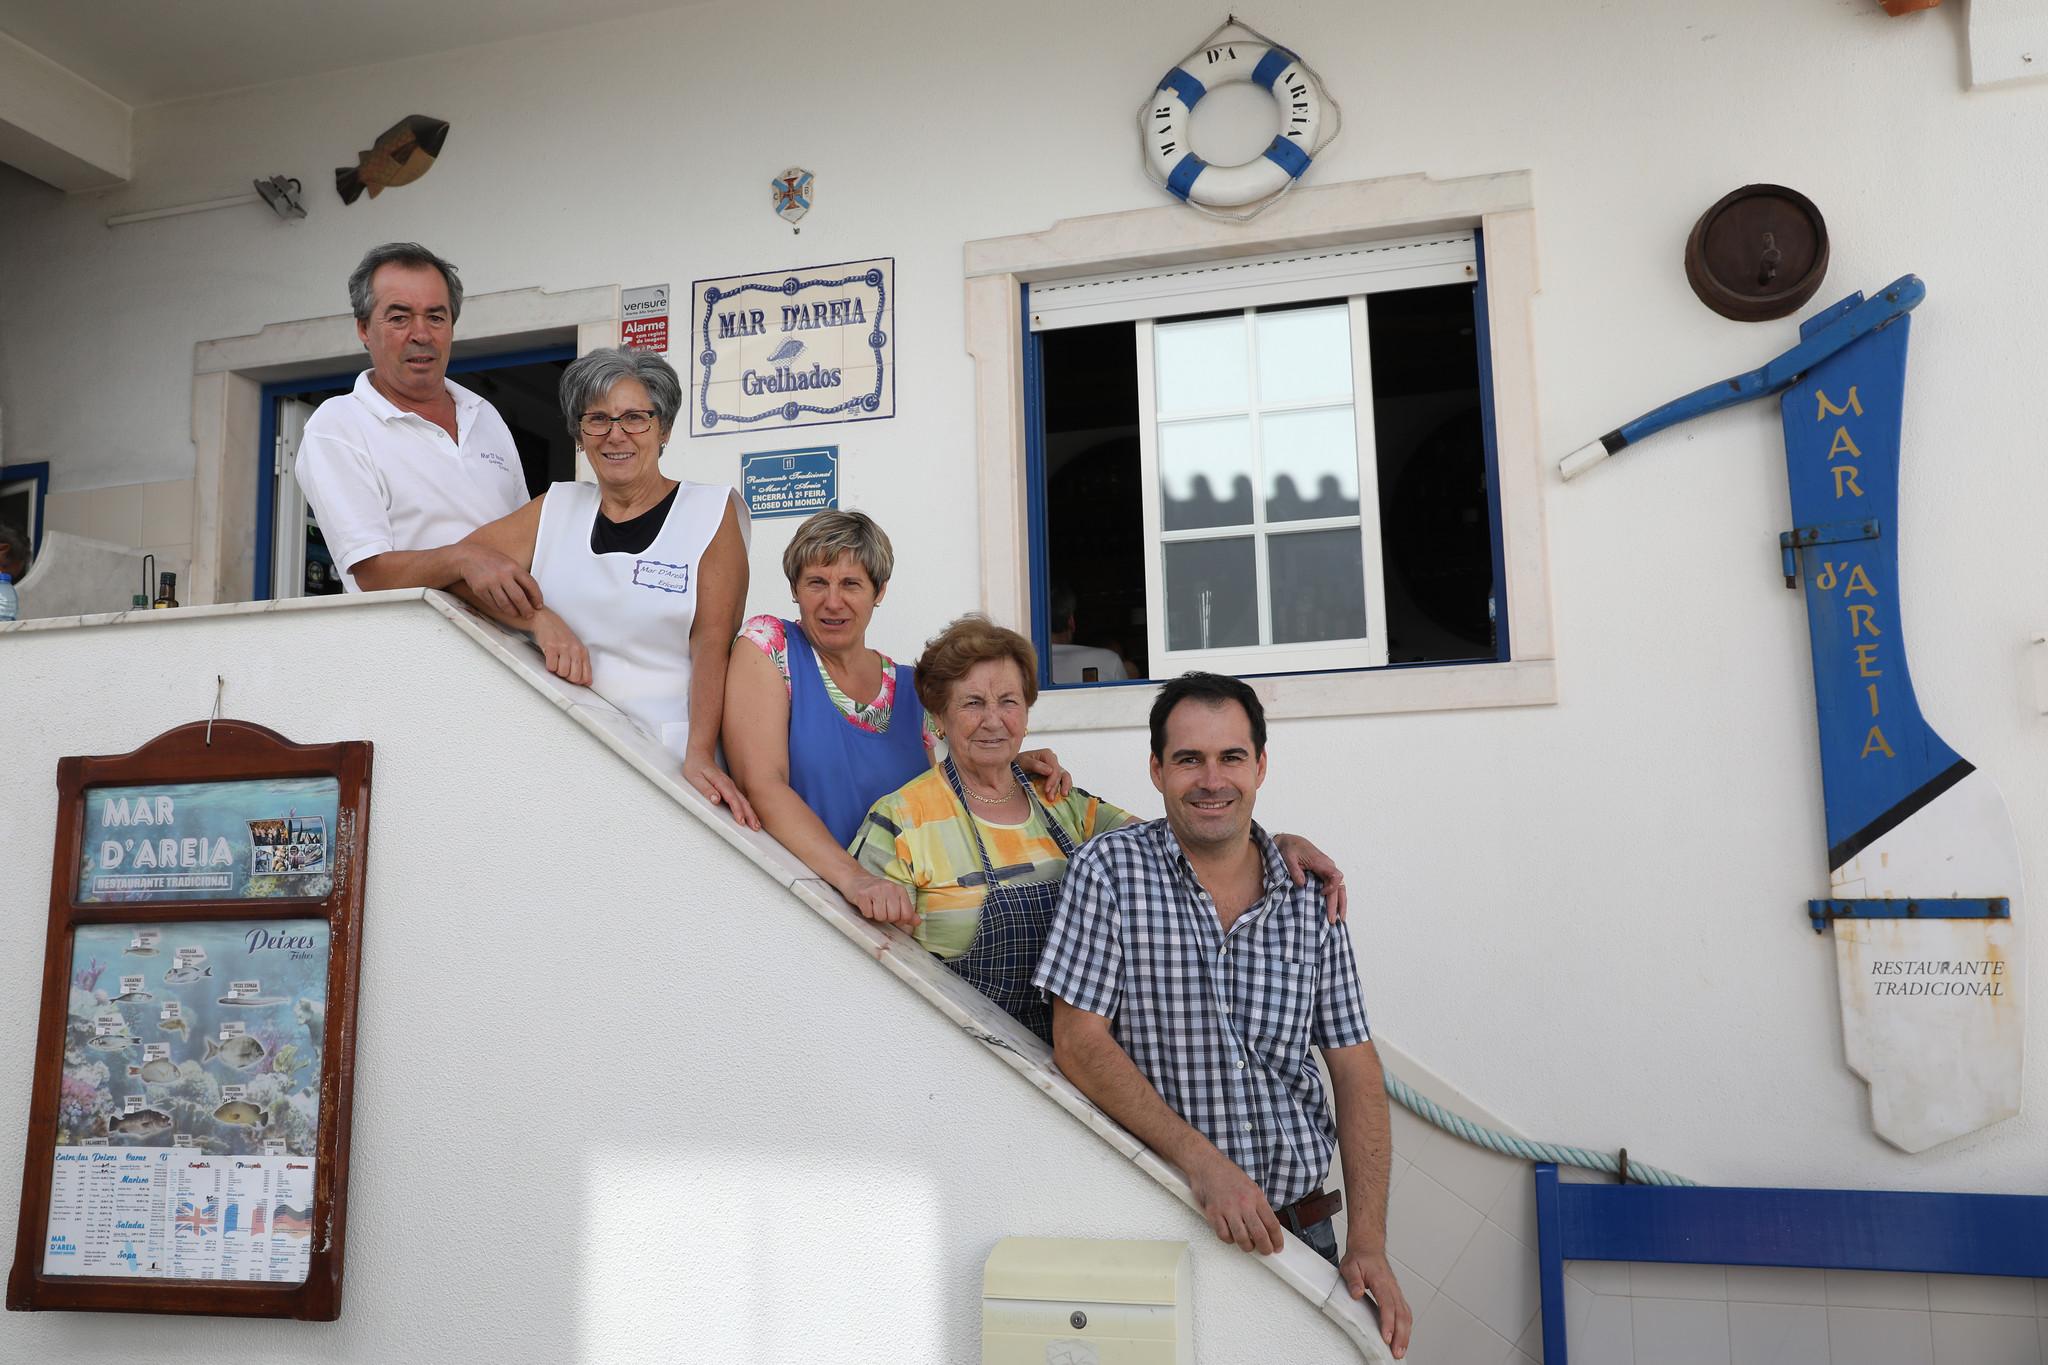 JCC Familia Rest  Mar D Areia 01.JPG